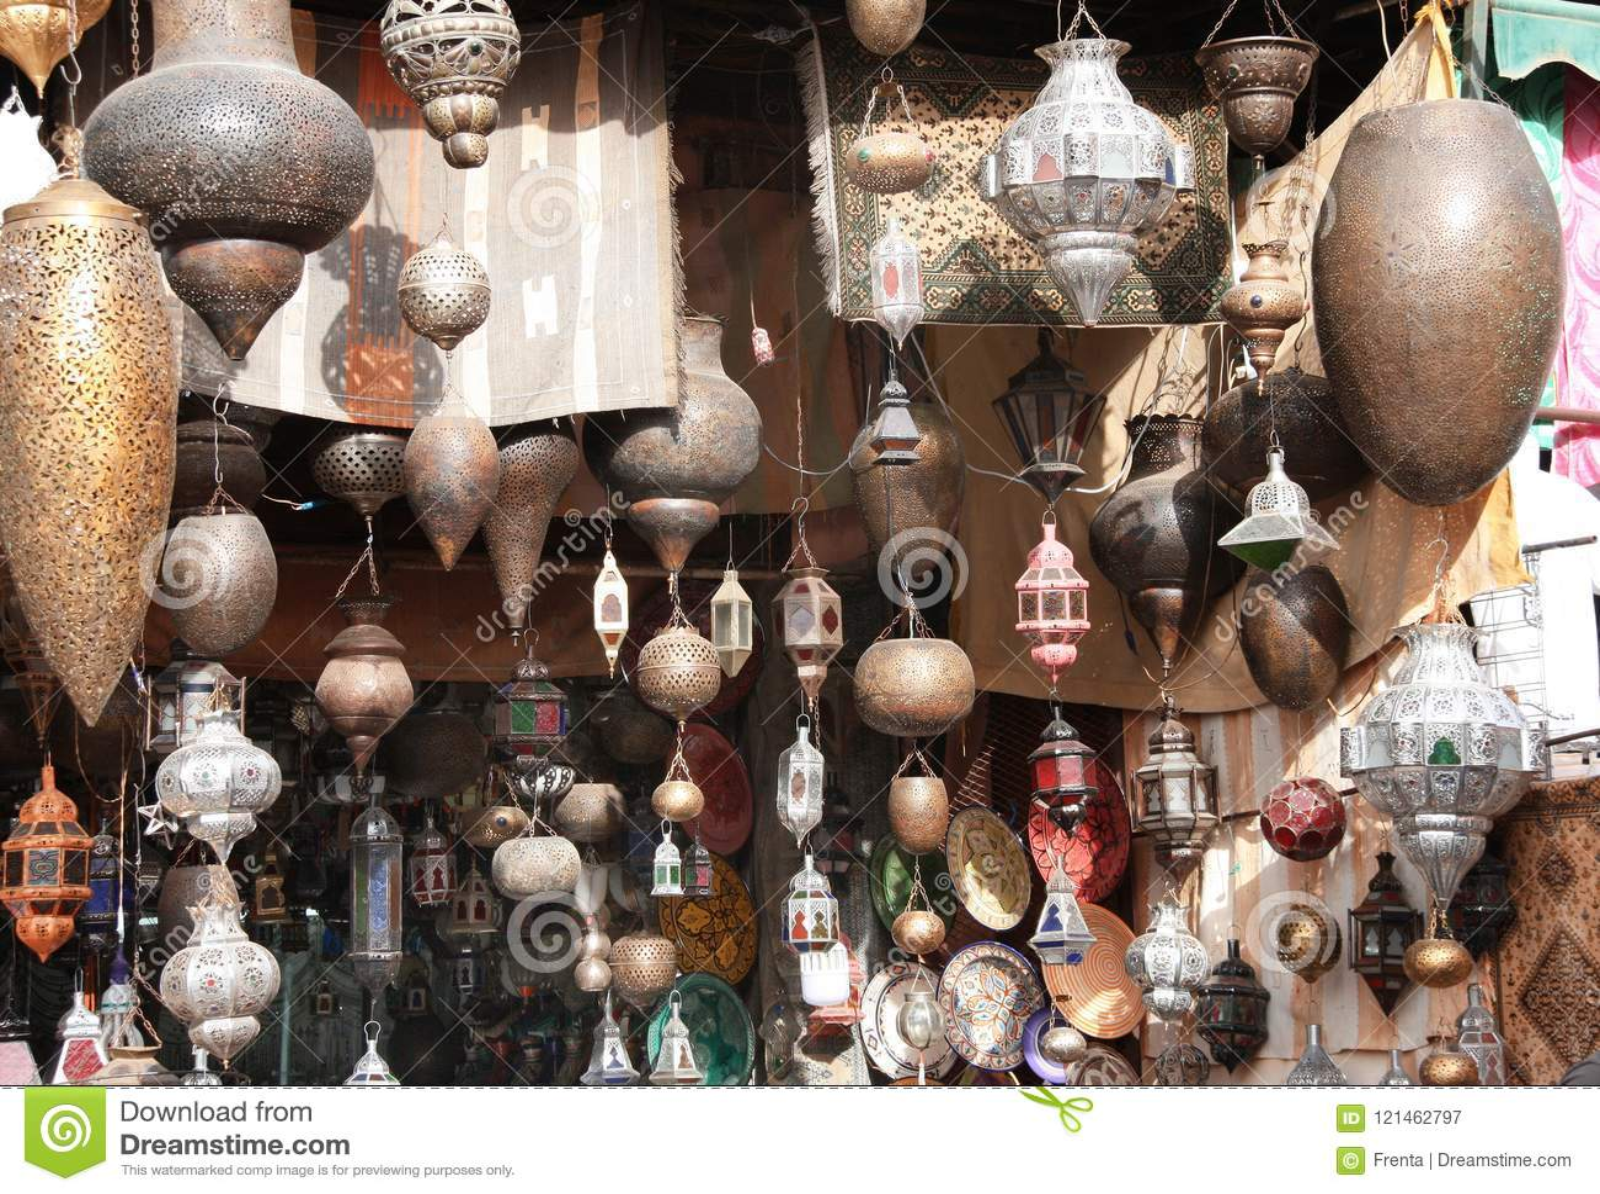 Traditional Moroccan Lanterns, Street Market, Morocco Stock Image